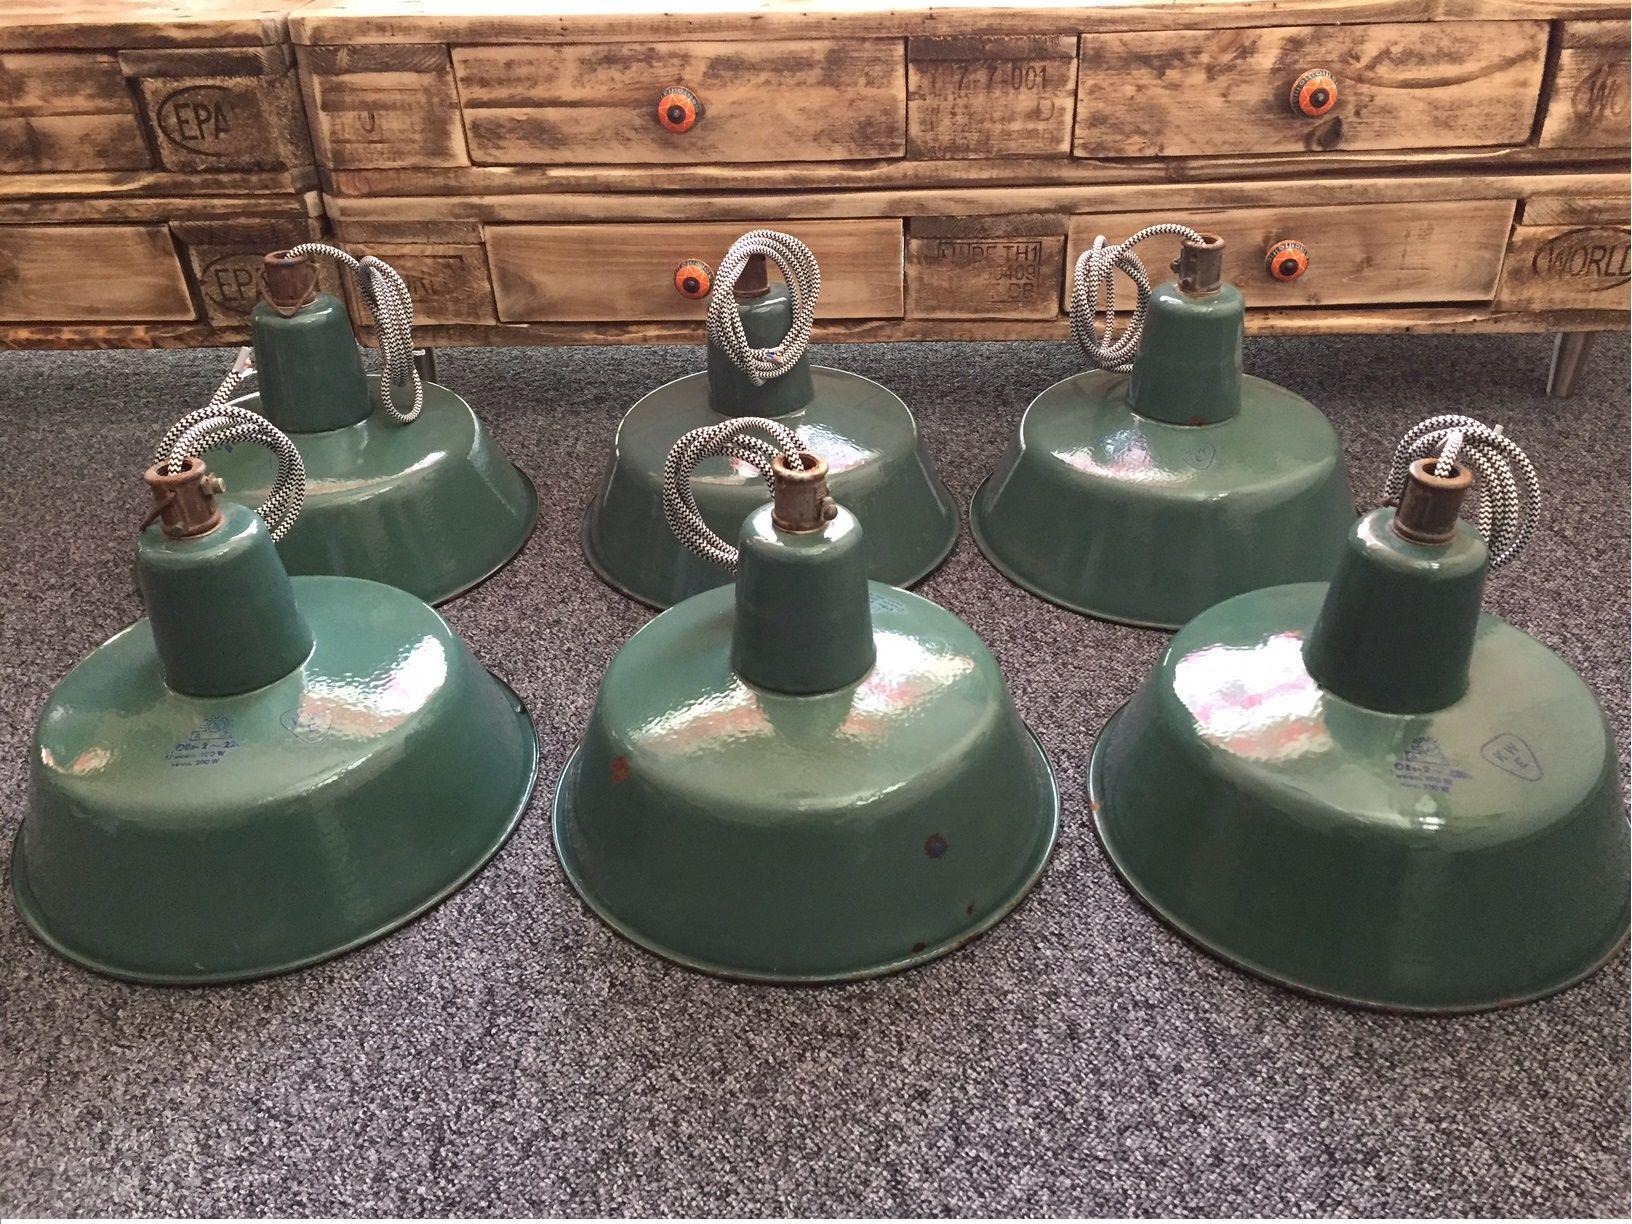 Alte Emaille Industrie Lampen Loft Industrie Lampen Alt Werklampen